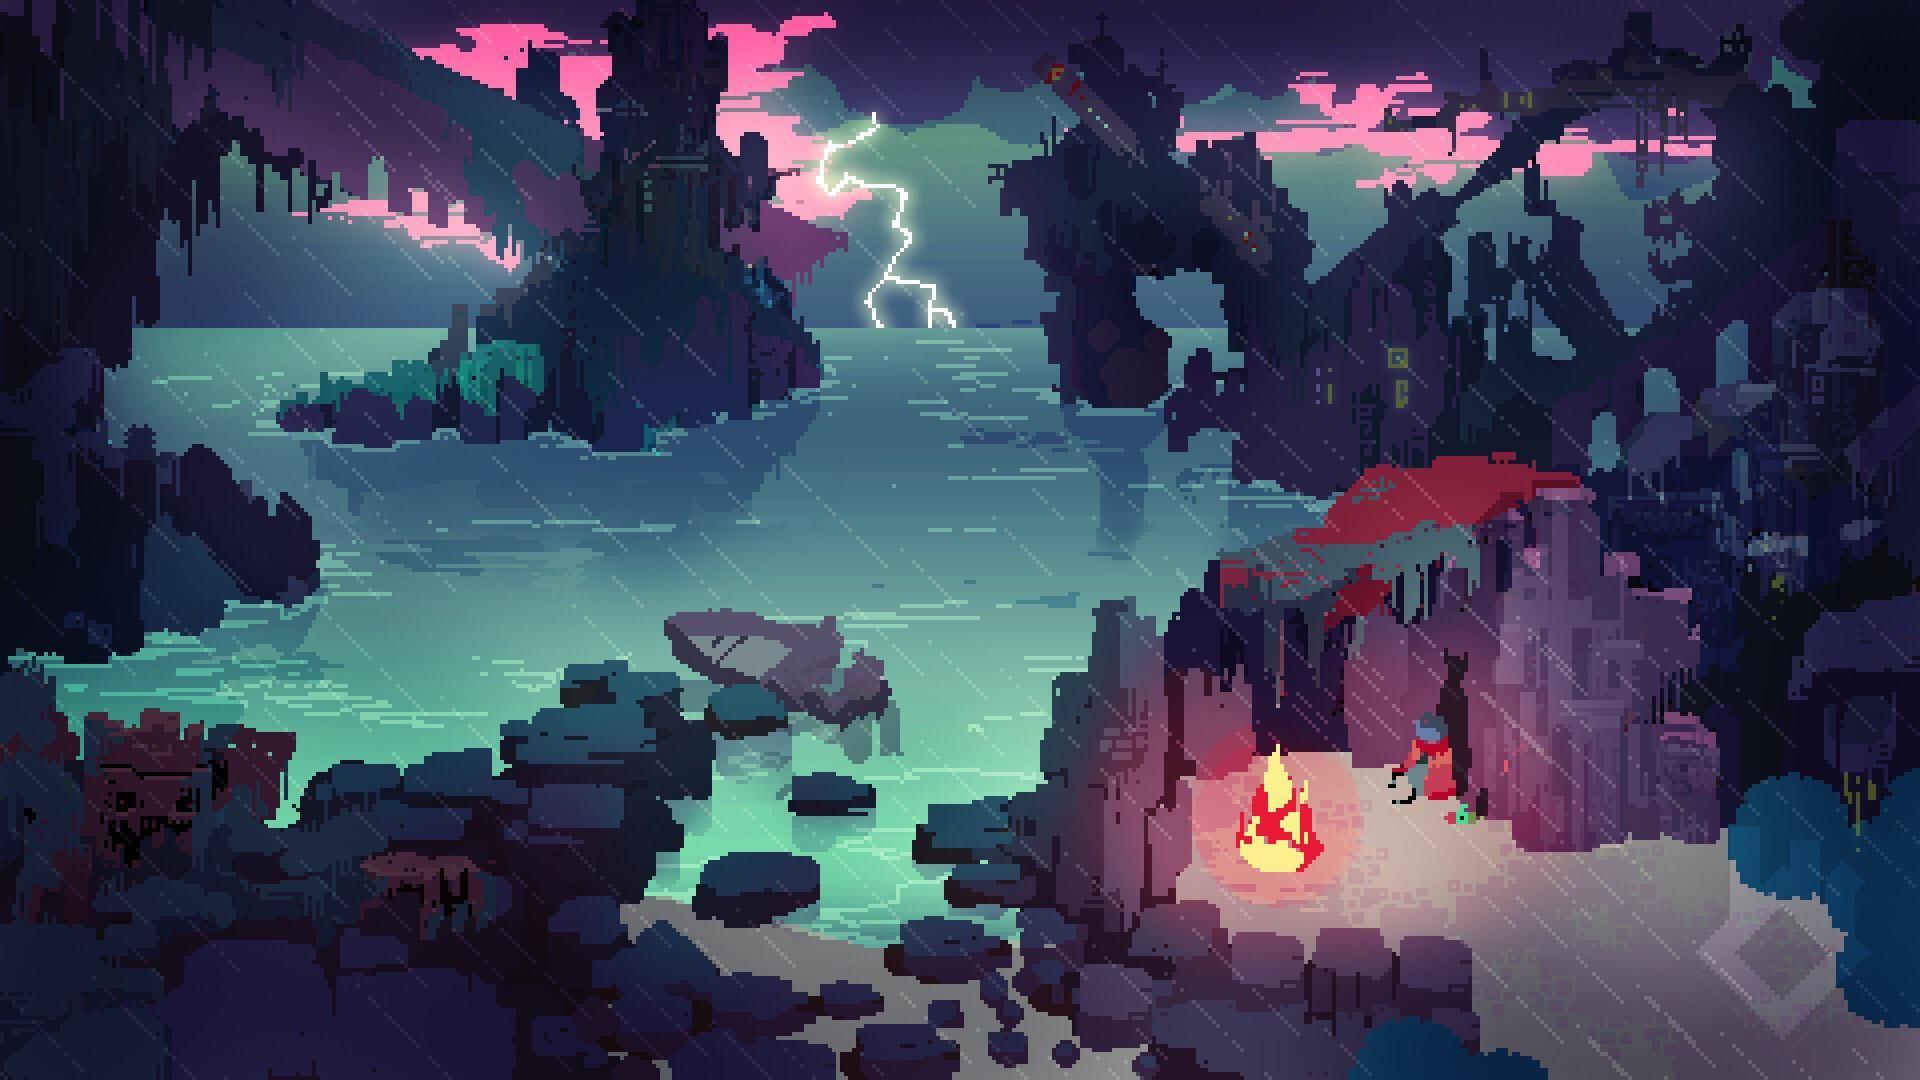 Stranded Cove Pixel Art 1920x1080 Pixel Art Landscape Pixel Art Design Pixel Art Background